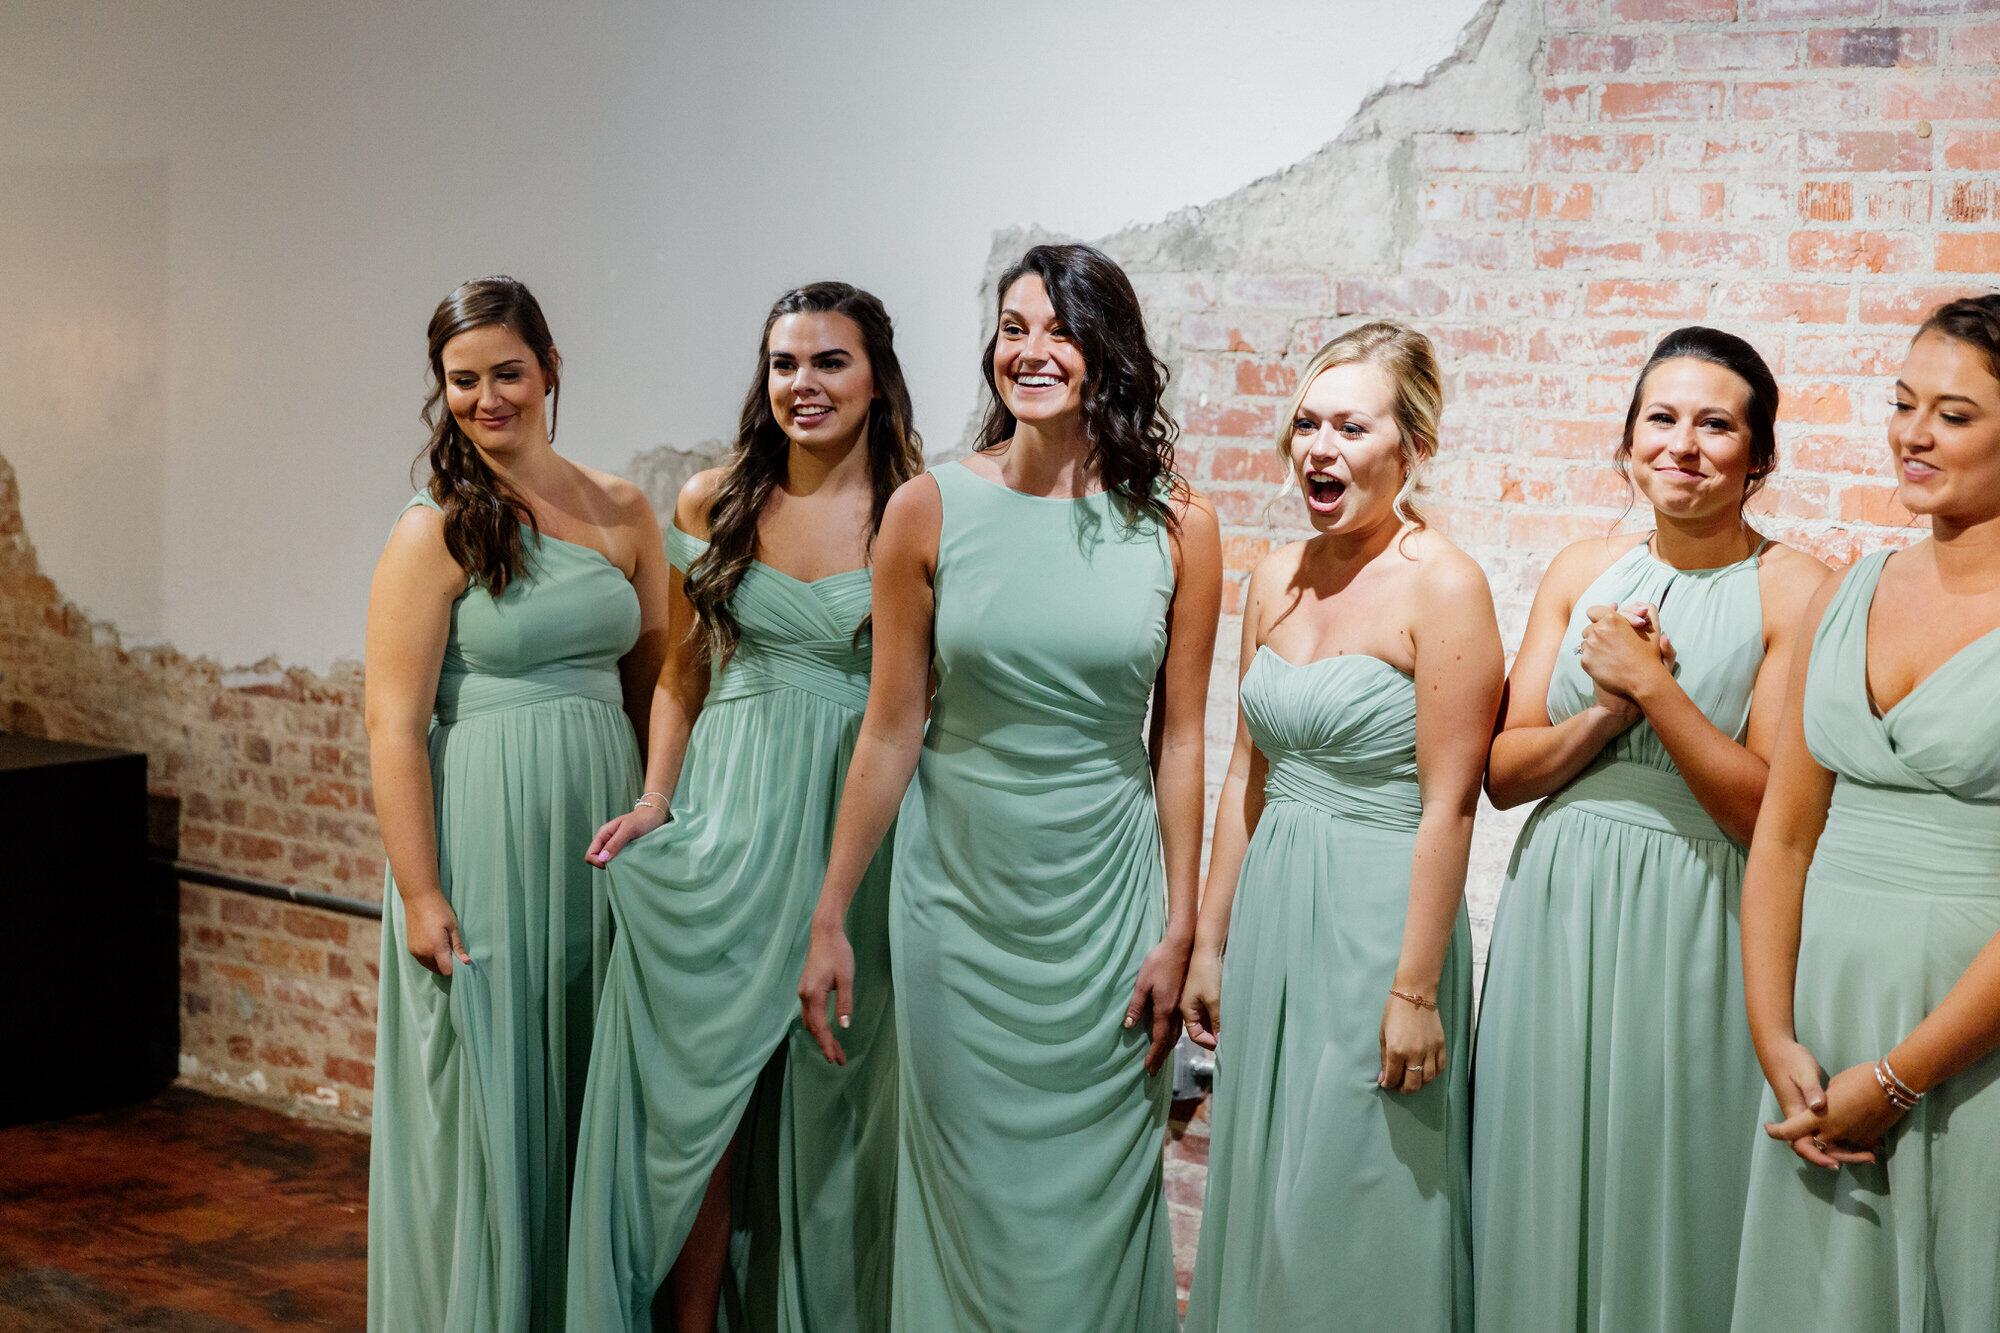 twigs-tempietto-wedding-greenville-downtown-266.JPG